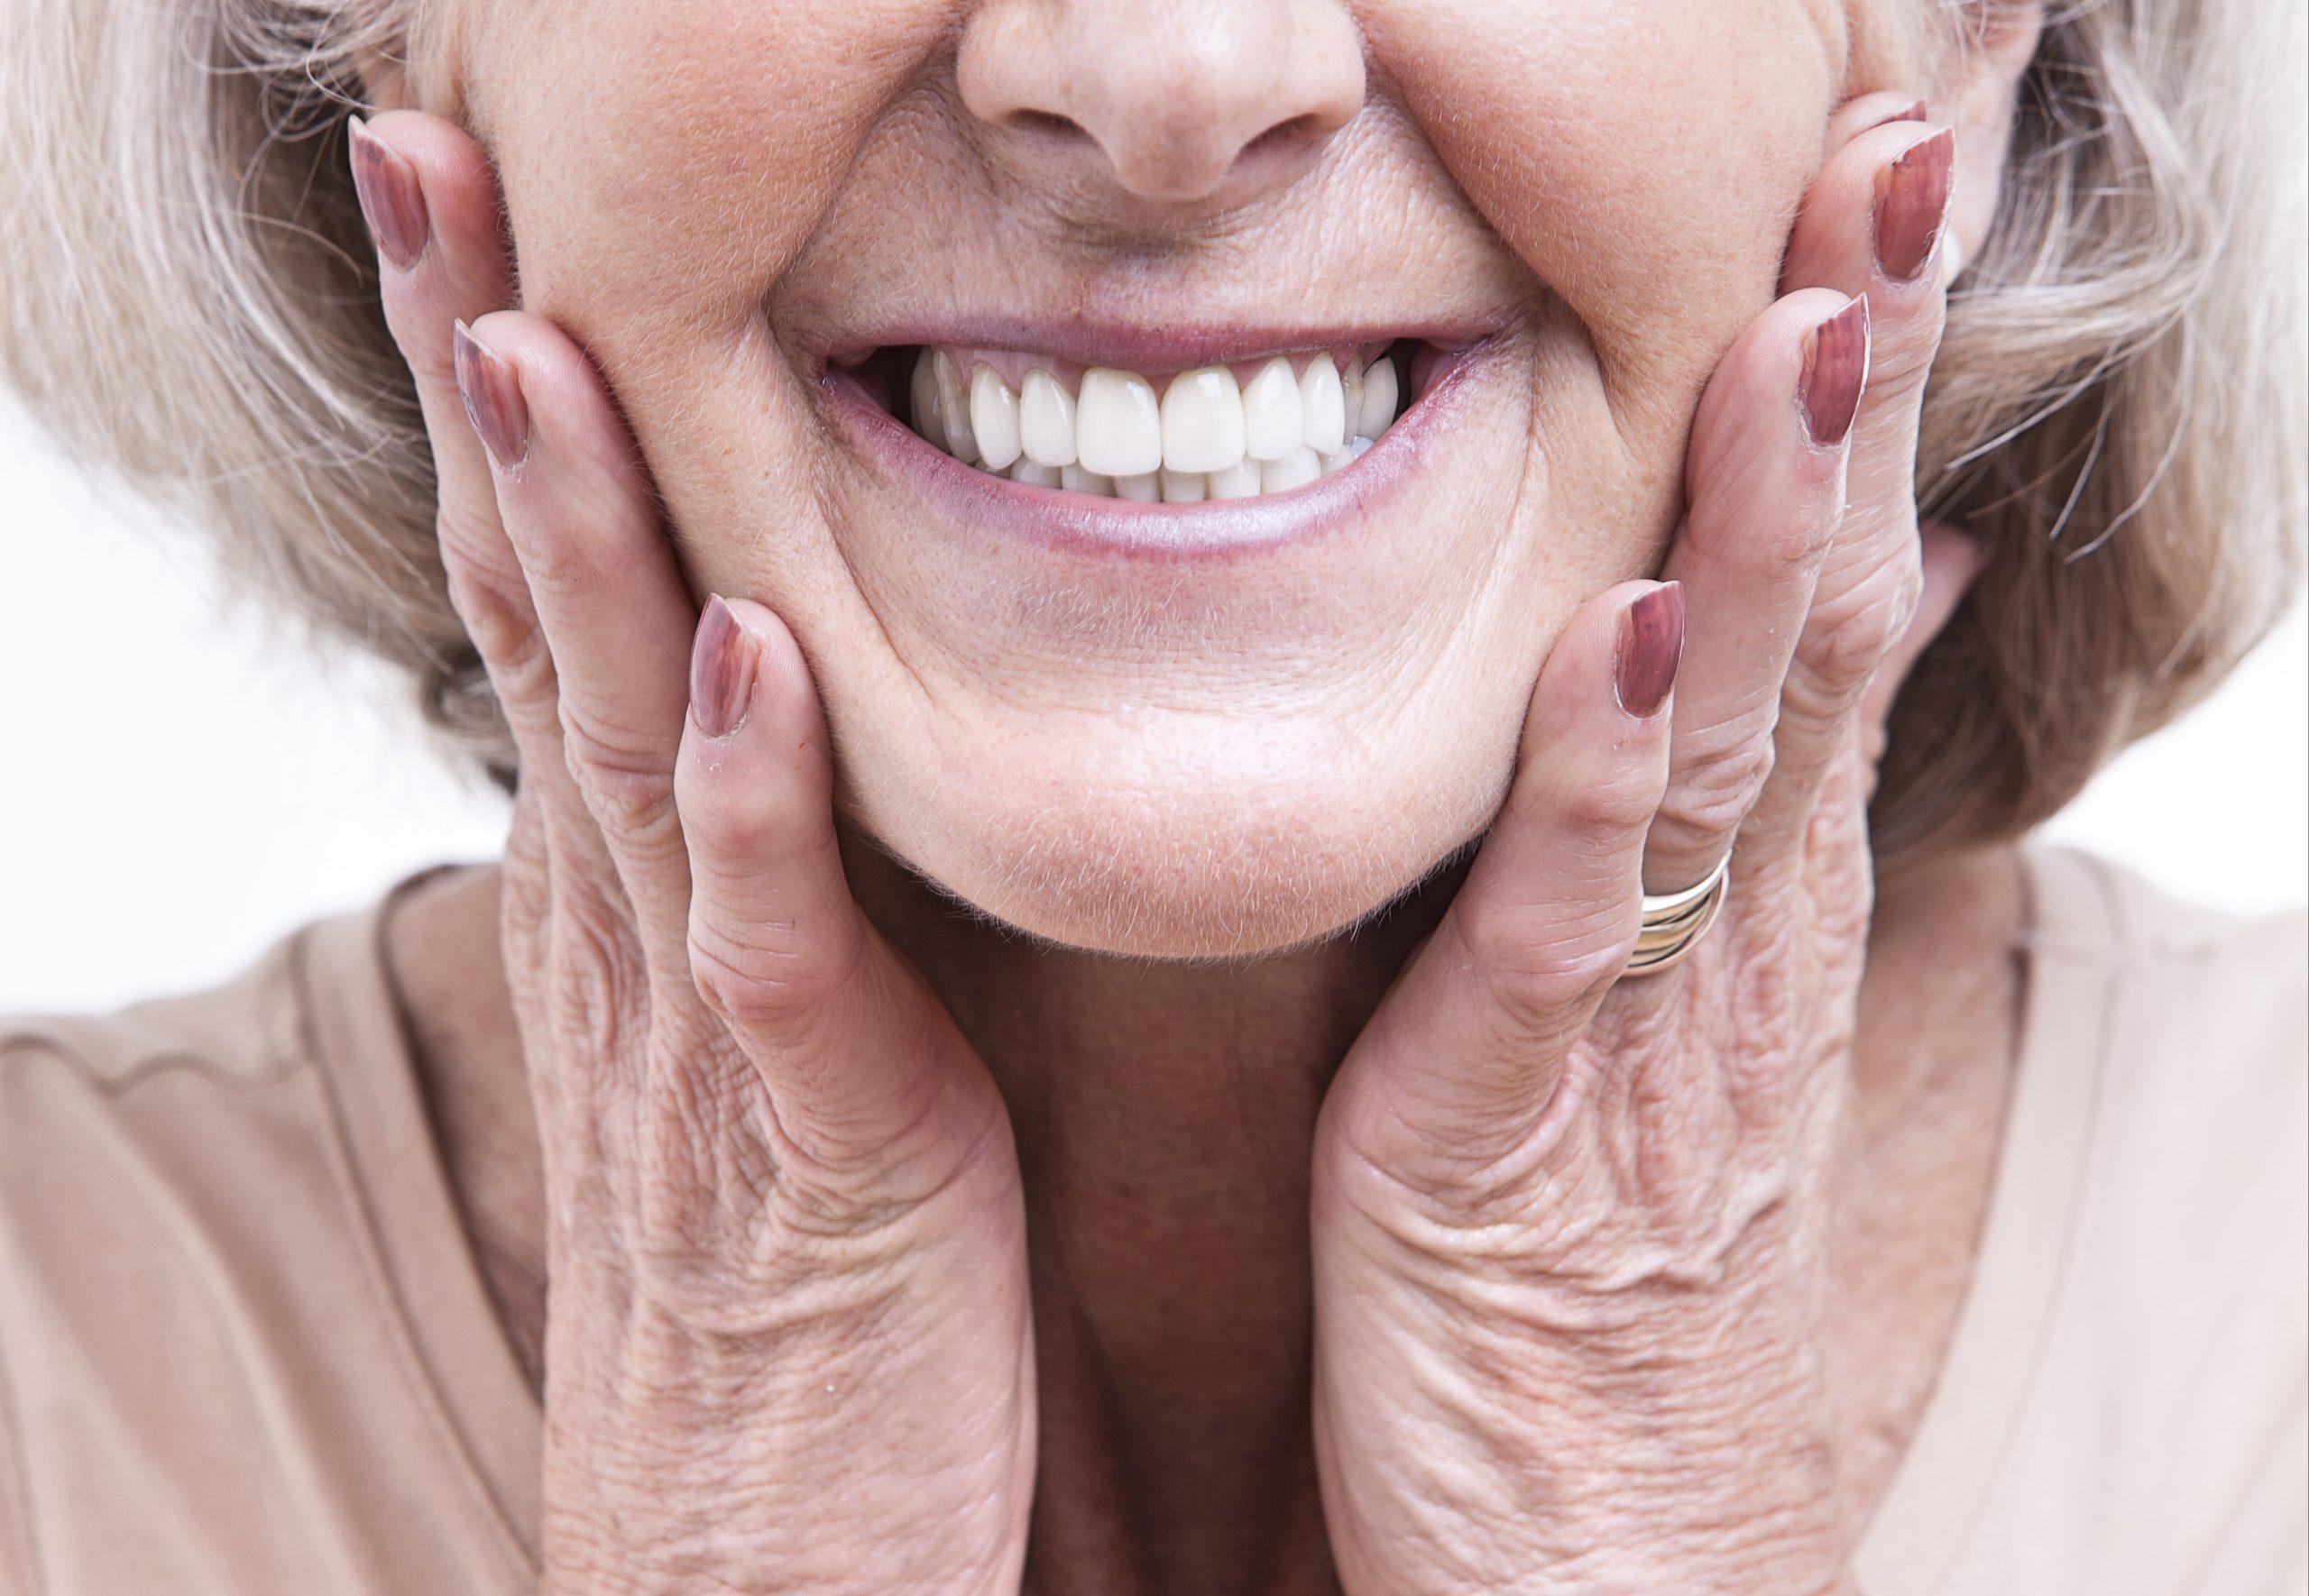 A woman shows off her bright white dental bridges.